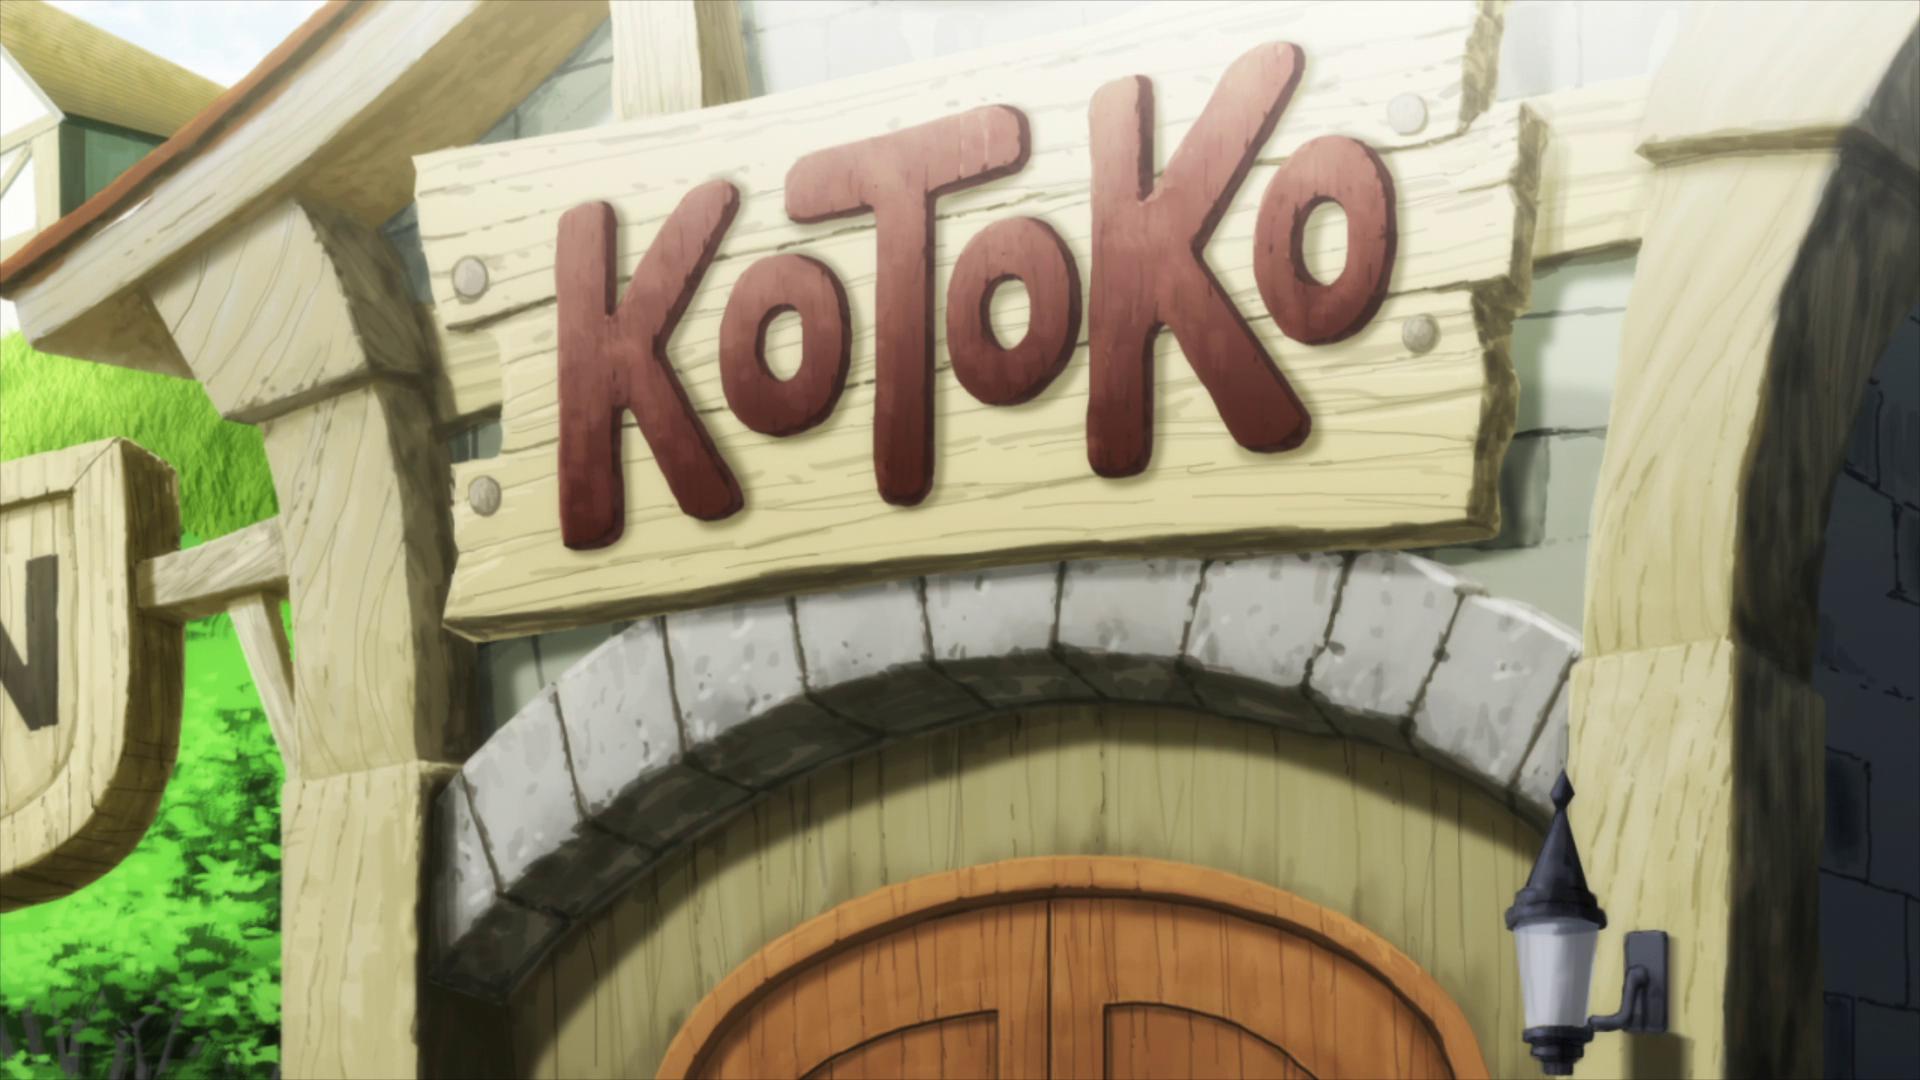 Гостиница Котоко